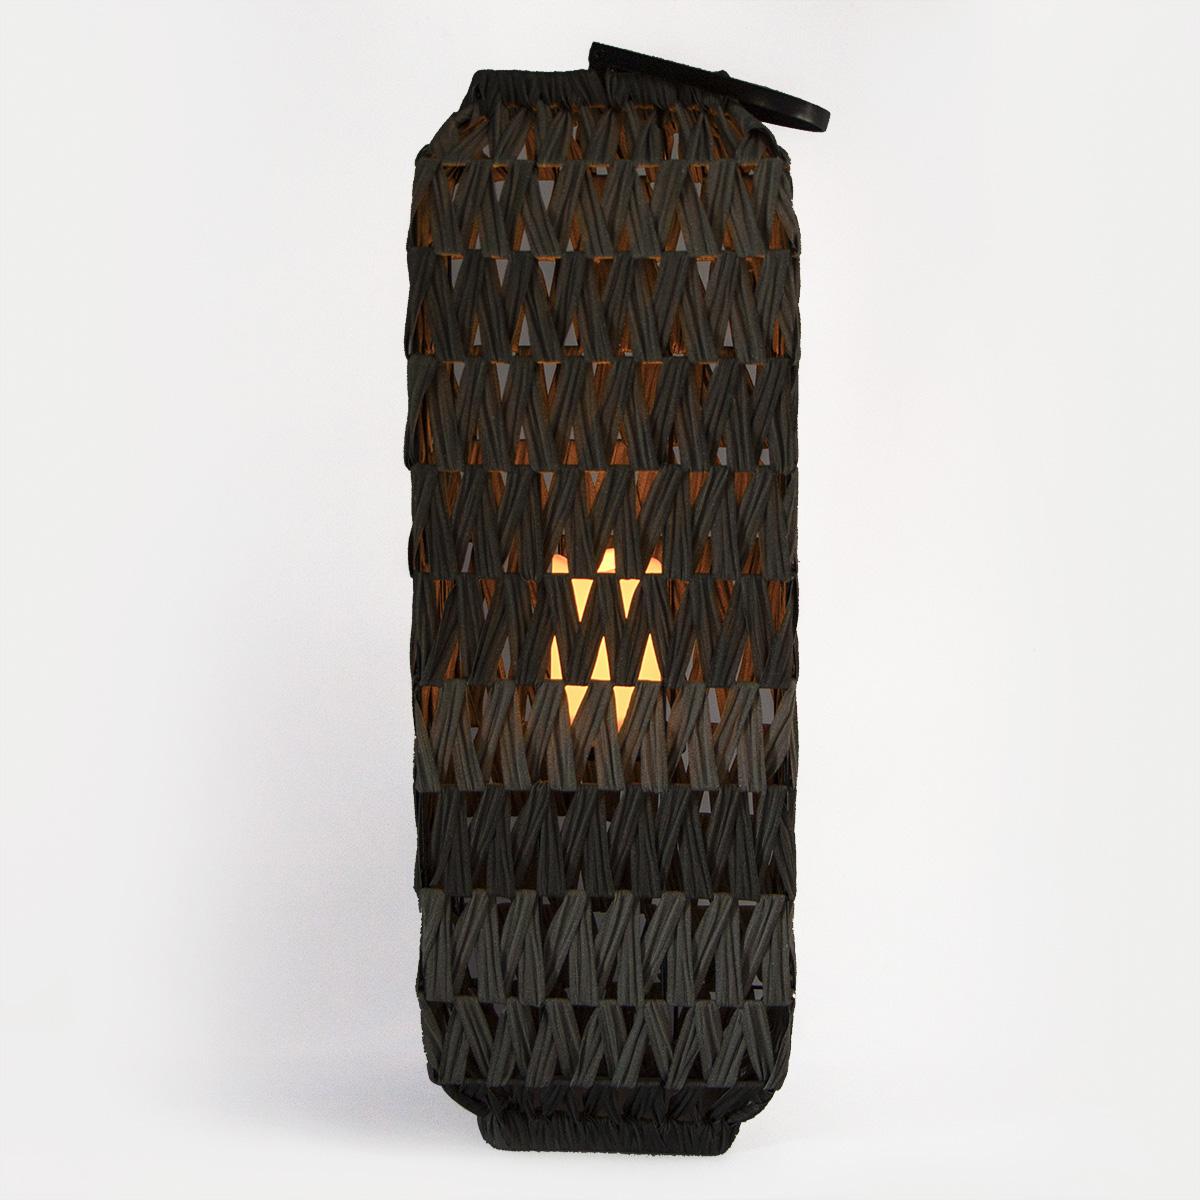 https://www.zhongxinlighting.com/products/patio-lighting/solar-rattan-lantern/